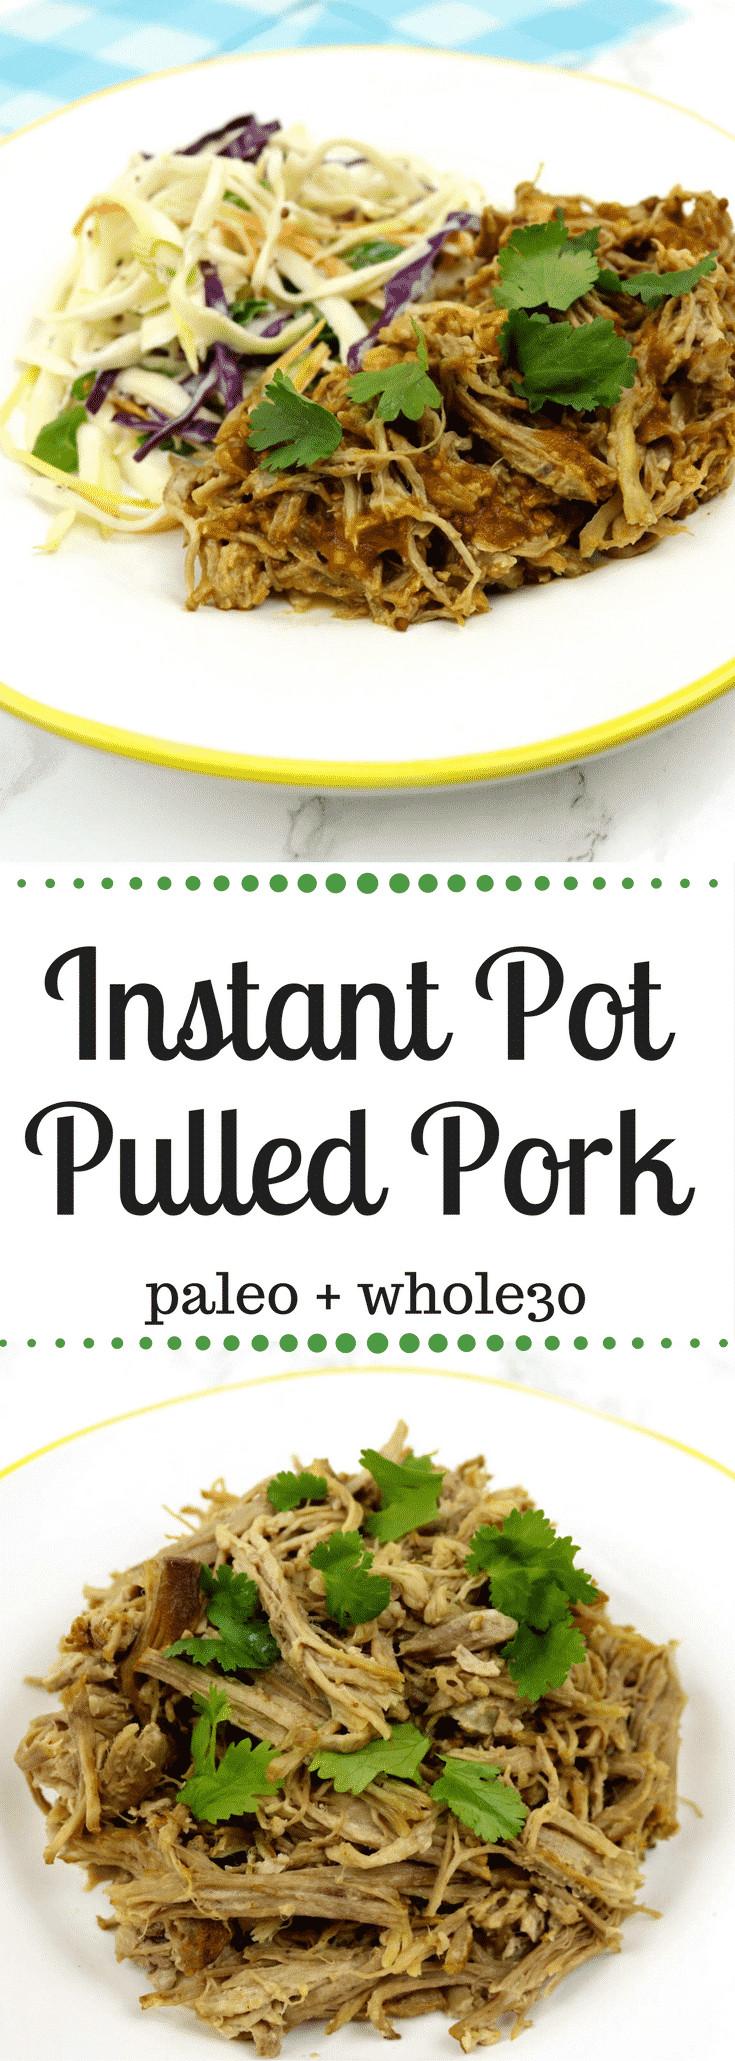 Pork Loin Instant Pot Paleo  Instant Pot Pulled Pork Paleo Whole30 Recipe